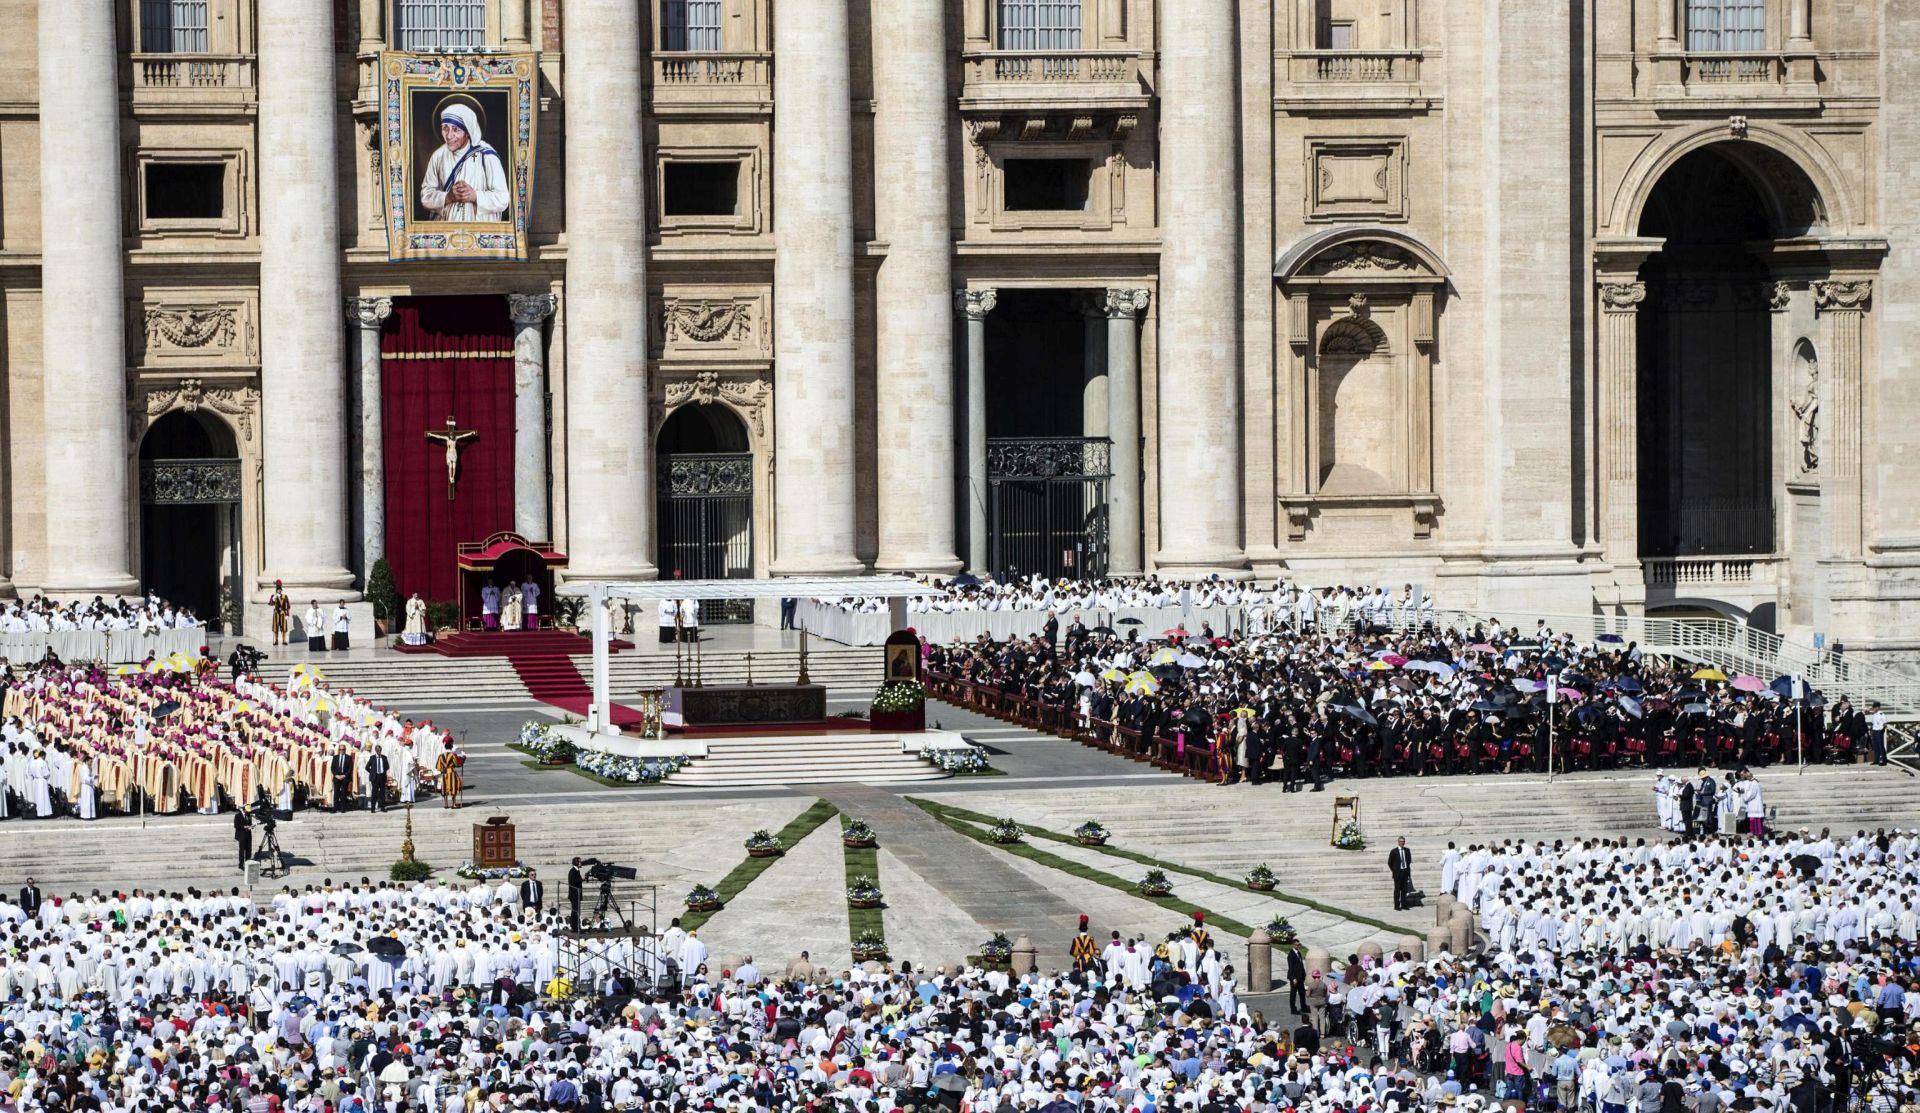 FOTO Papa Franjo Majku Terezu proglasio sveticom